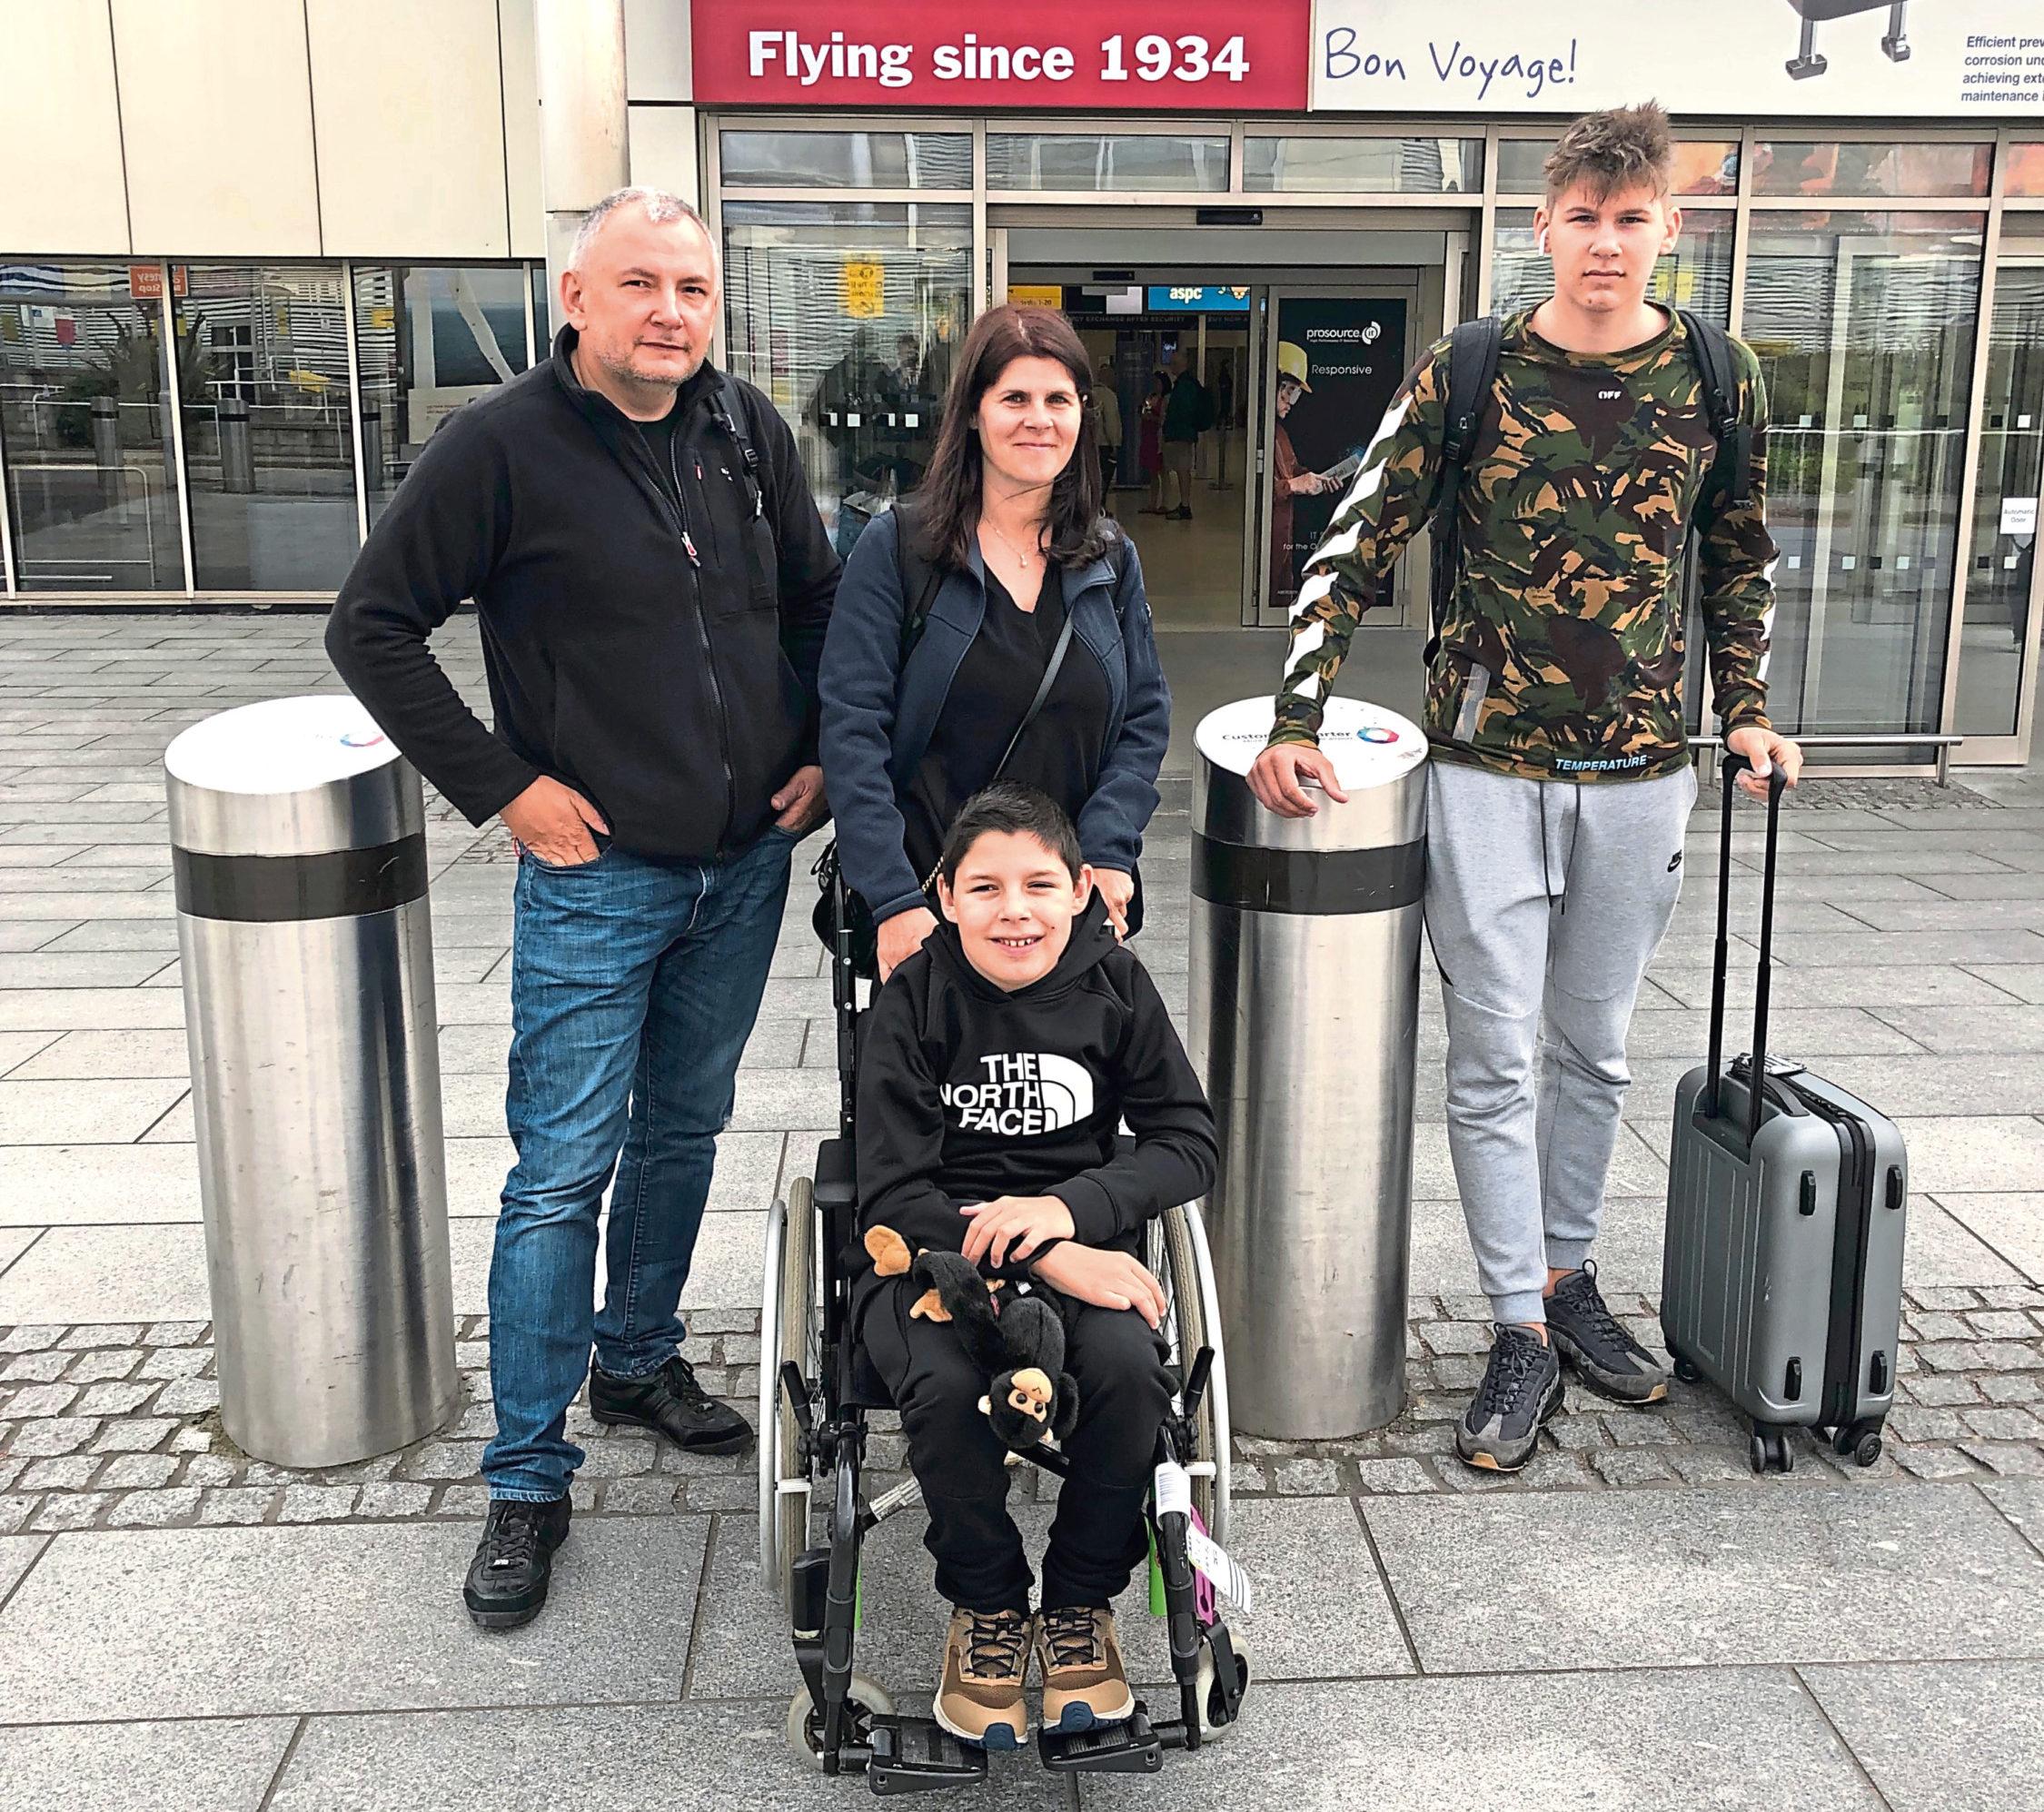 Dad Matty, mum Elena, Luca and brother Matty on their way